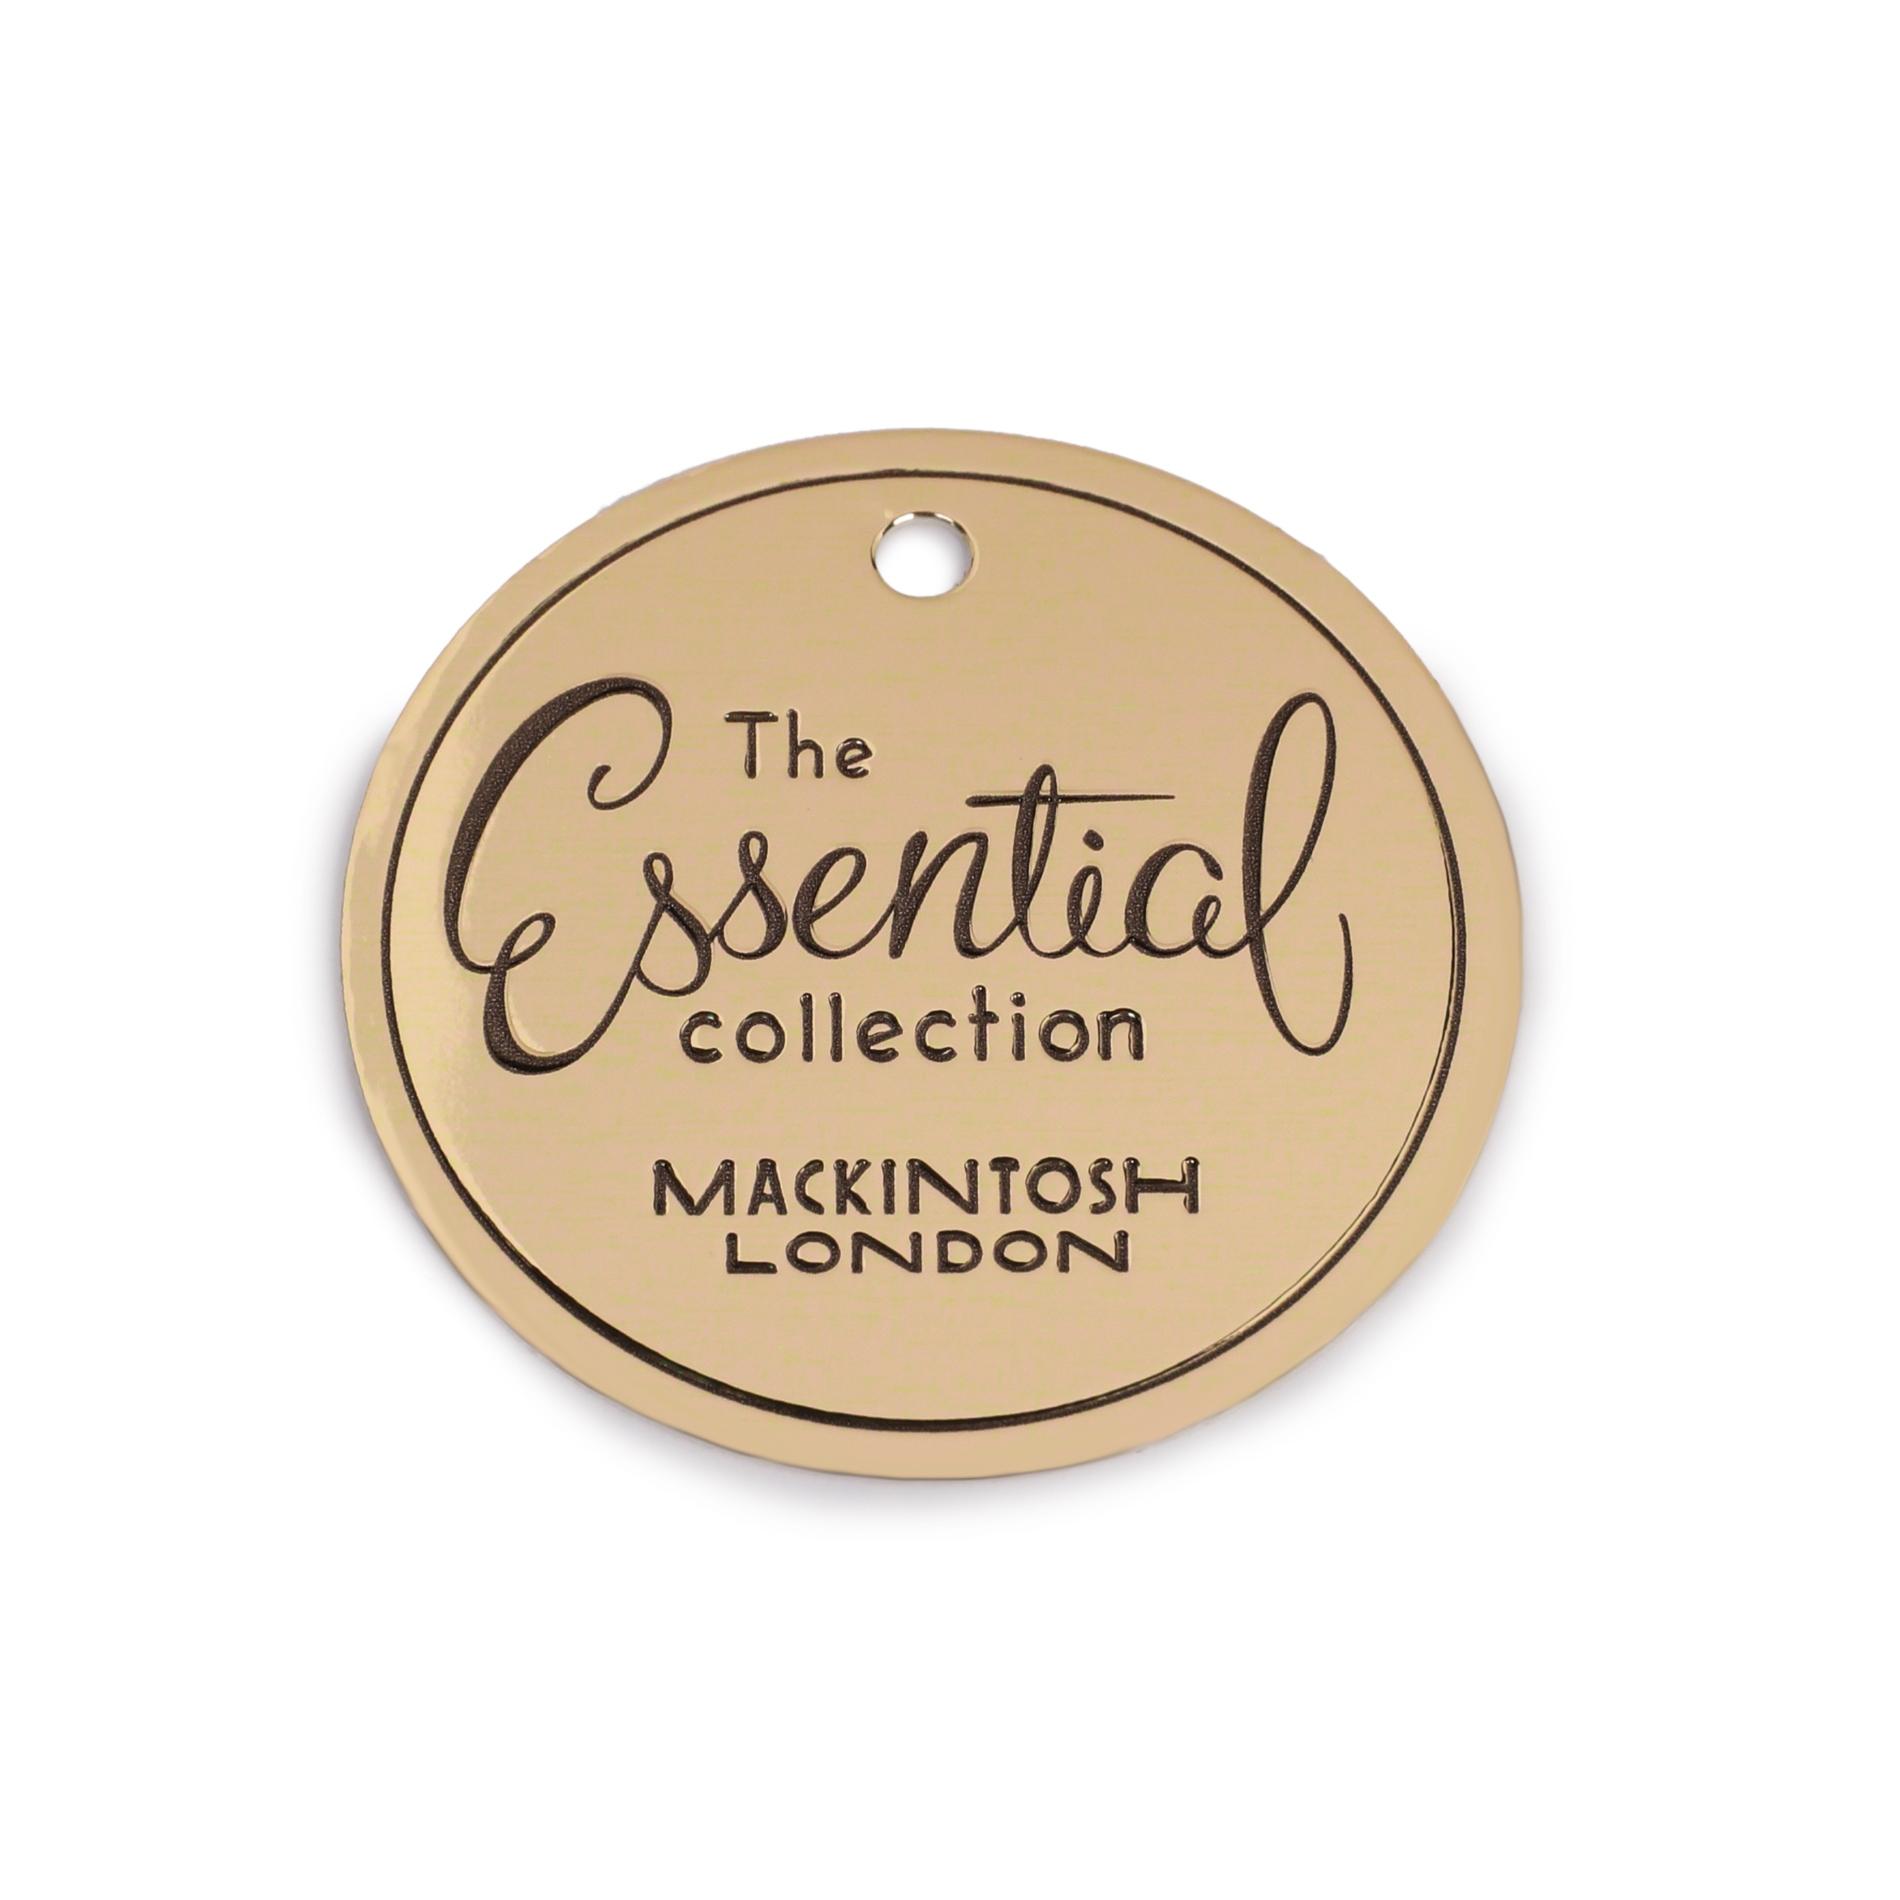 【The Essential Collection】 ファインカウントニットクルーネックプルオーバー